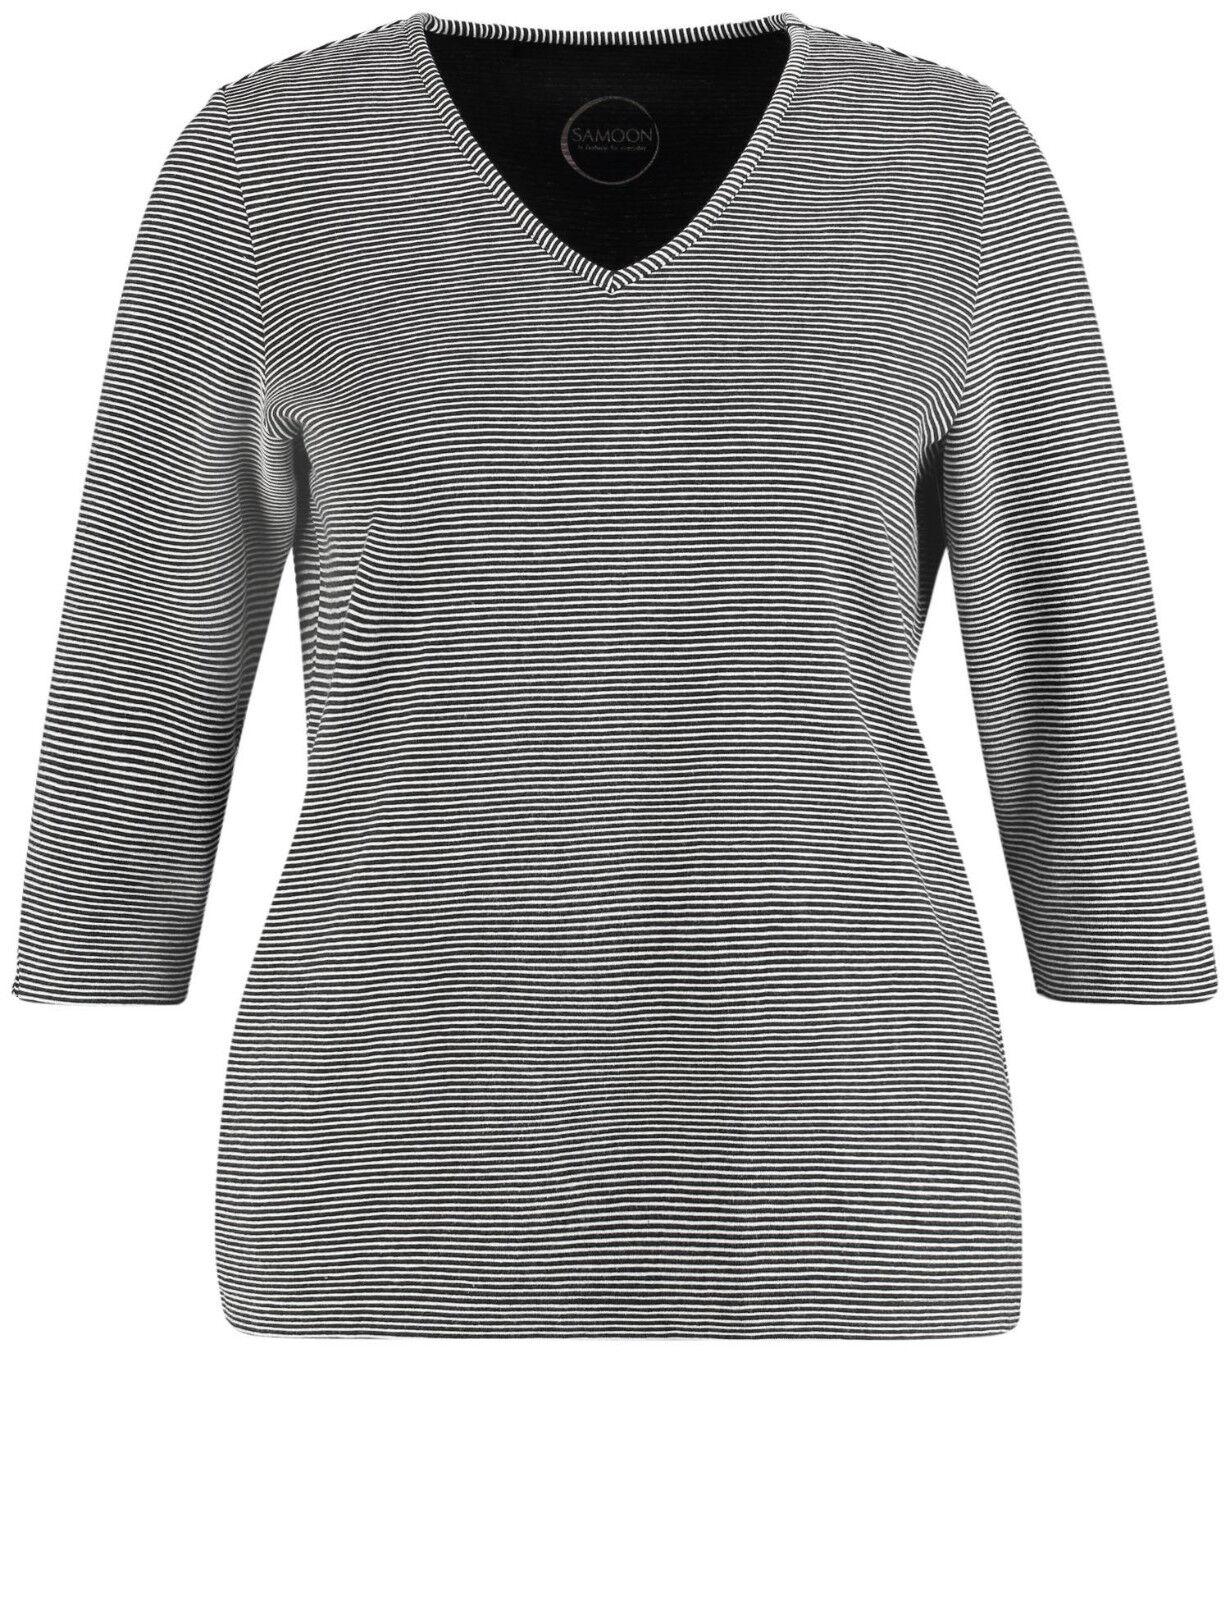 Samoon V-shirt con cuciture-struttura by Gerry Weber NUOVO TSHIRT TSHIRT TSHIRT DONNA TG. 54 1b09ae